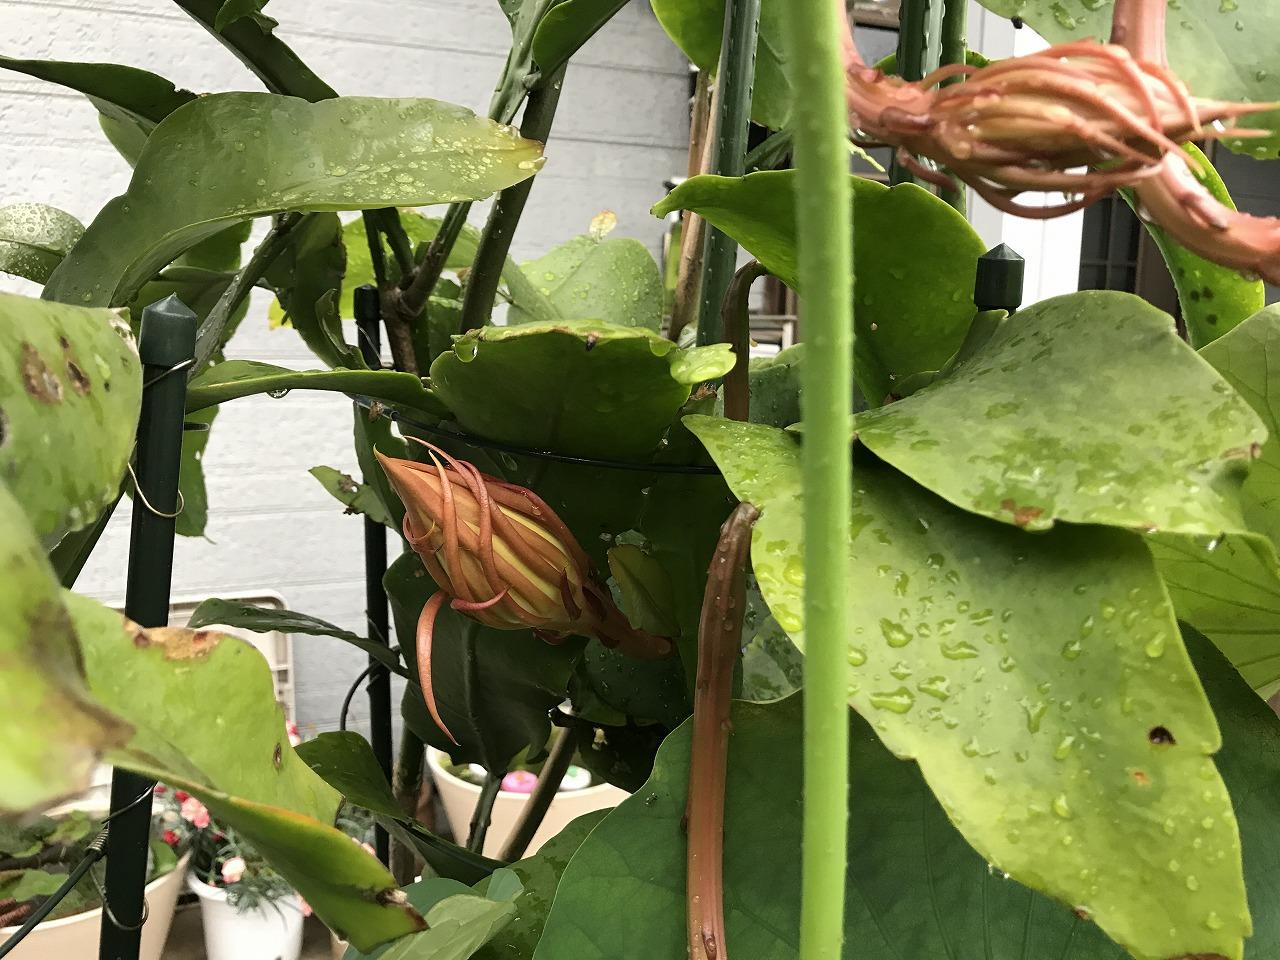 20170705-EpiphyllumOxpetalum-I01.jpg